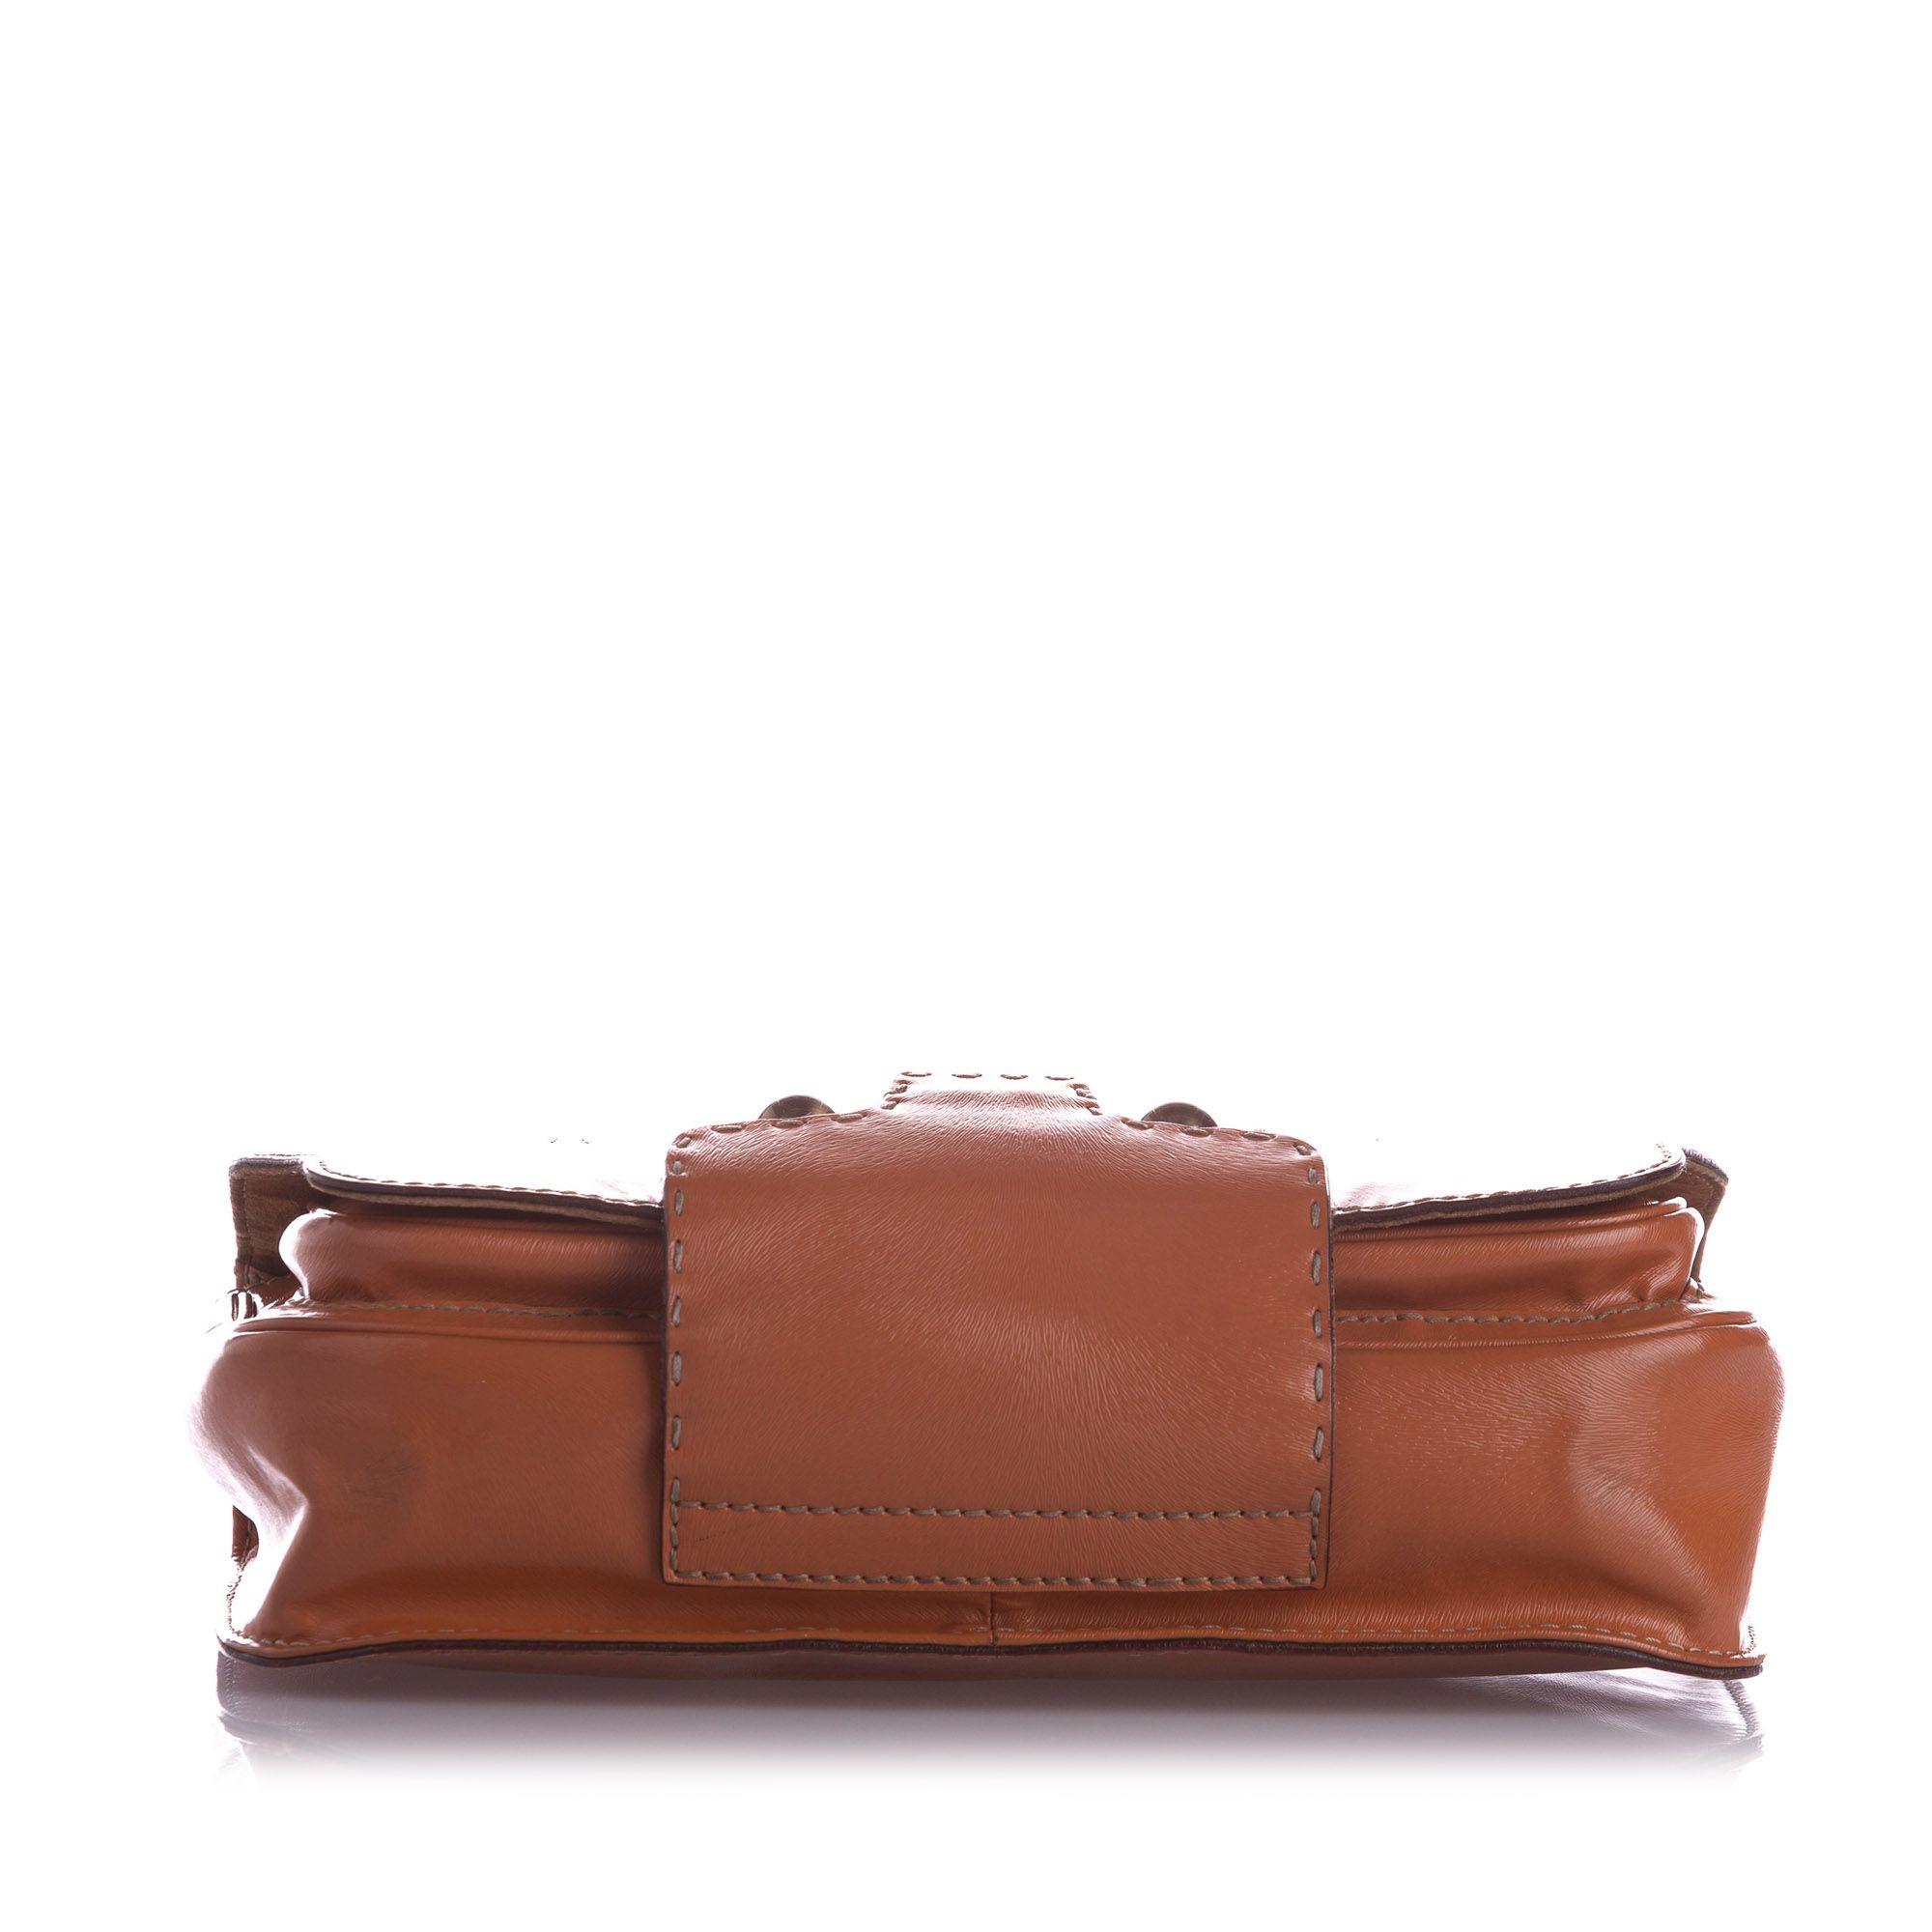 Vintage Fendi Leather Satchel Brown